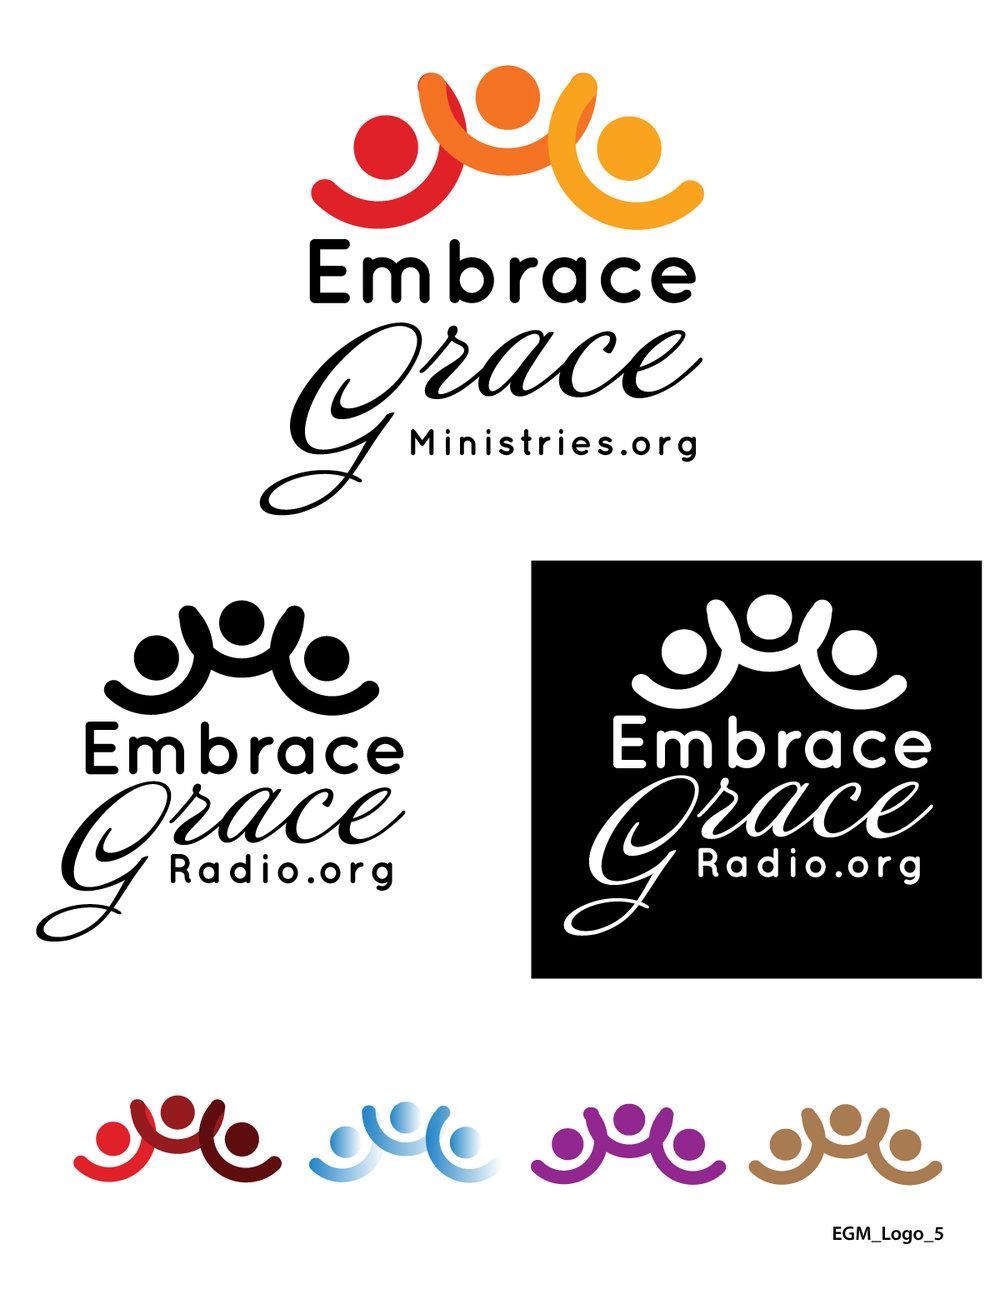 EGM_Logo_5.jpg